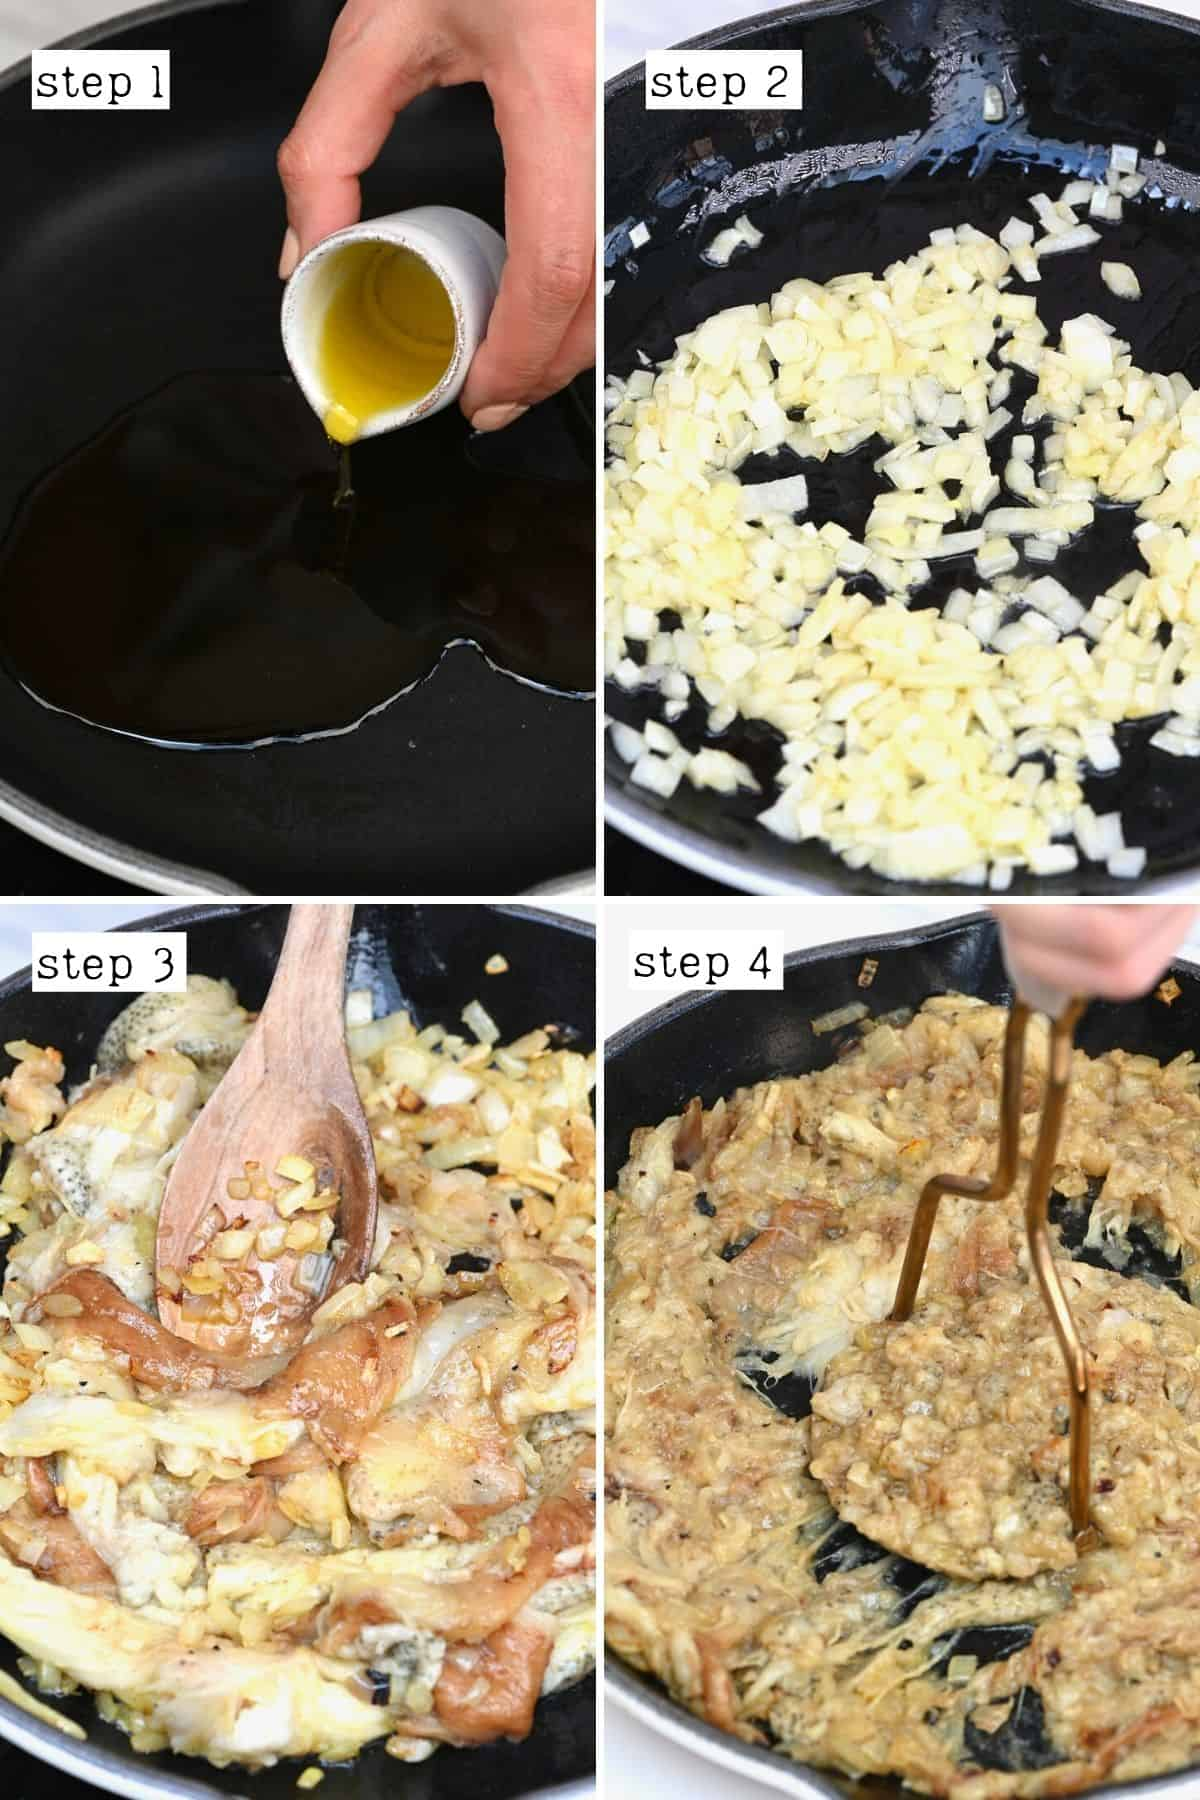 Steps for preparing kashke bademjan